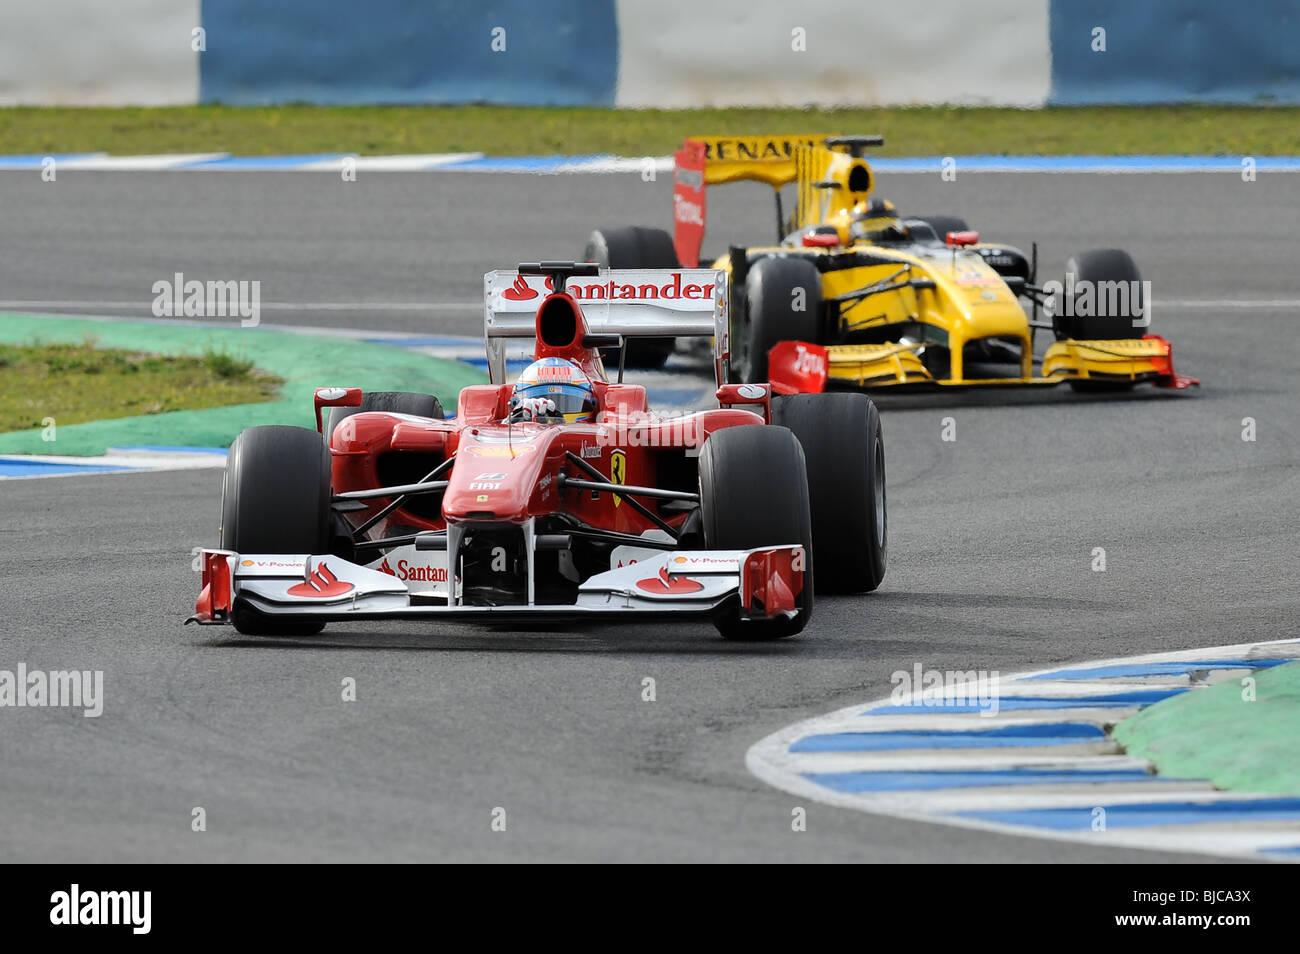 F1 formula 1 Renault ferrari fernando alonso - Stock Image